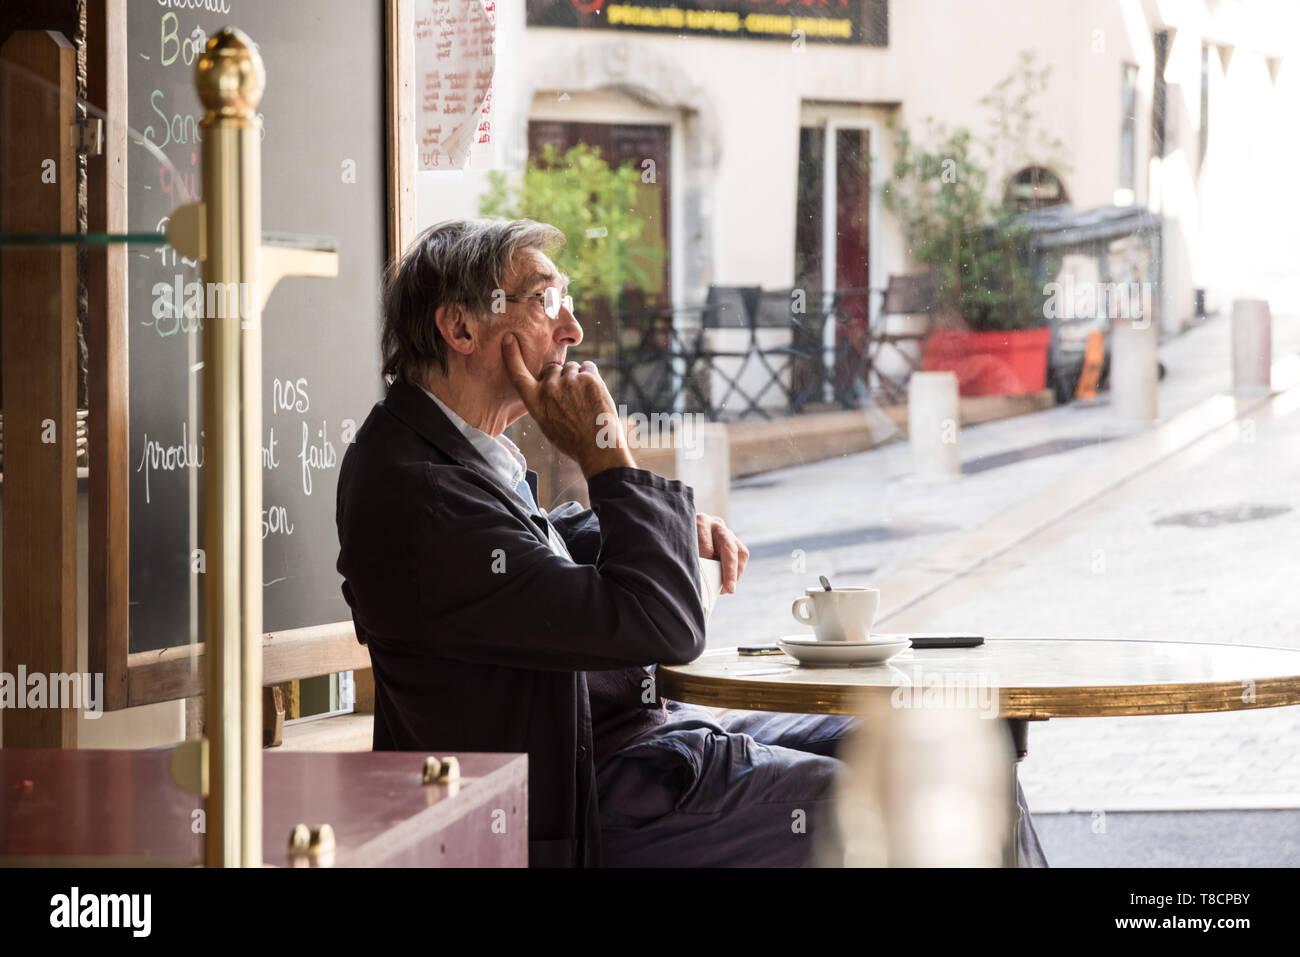 Lyon, 1. Arrondissement, Rue des Capucins, ein Mann sitzt in einem Cafe - Lyon, 1. Arrondissement, Rue des Capucins, a Man in a Cafe Stock Photo